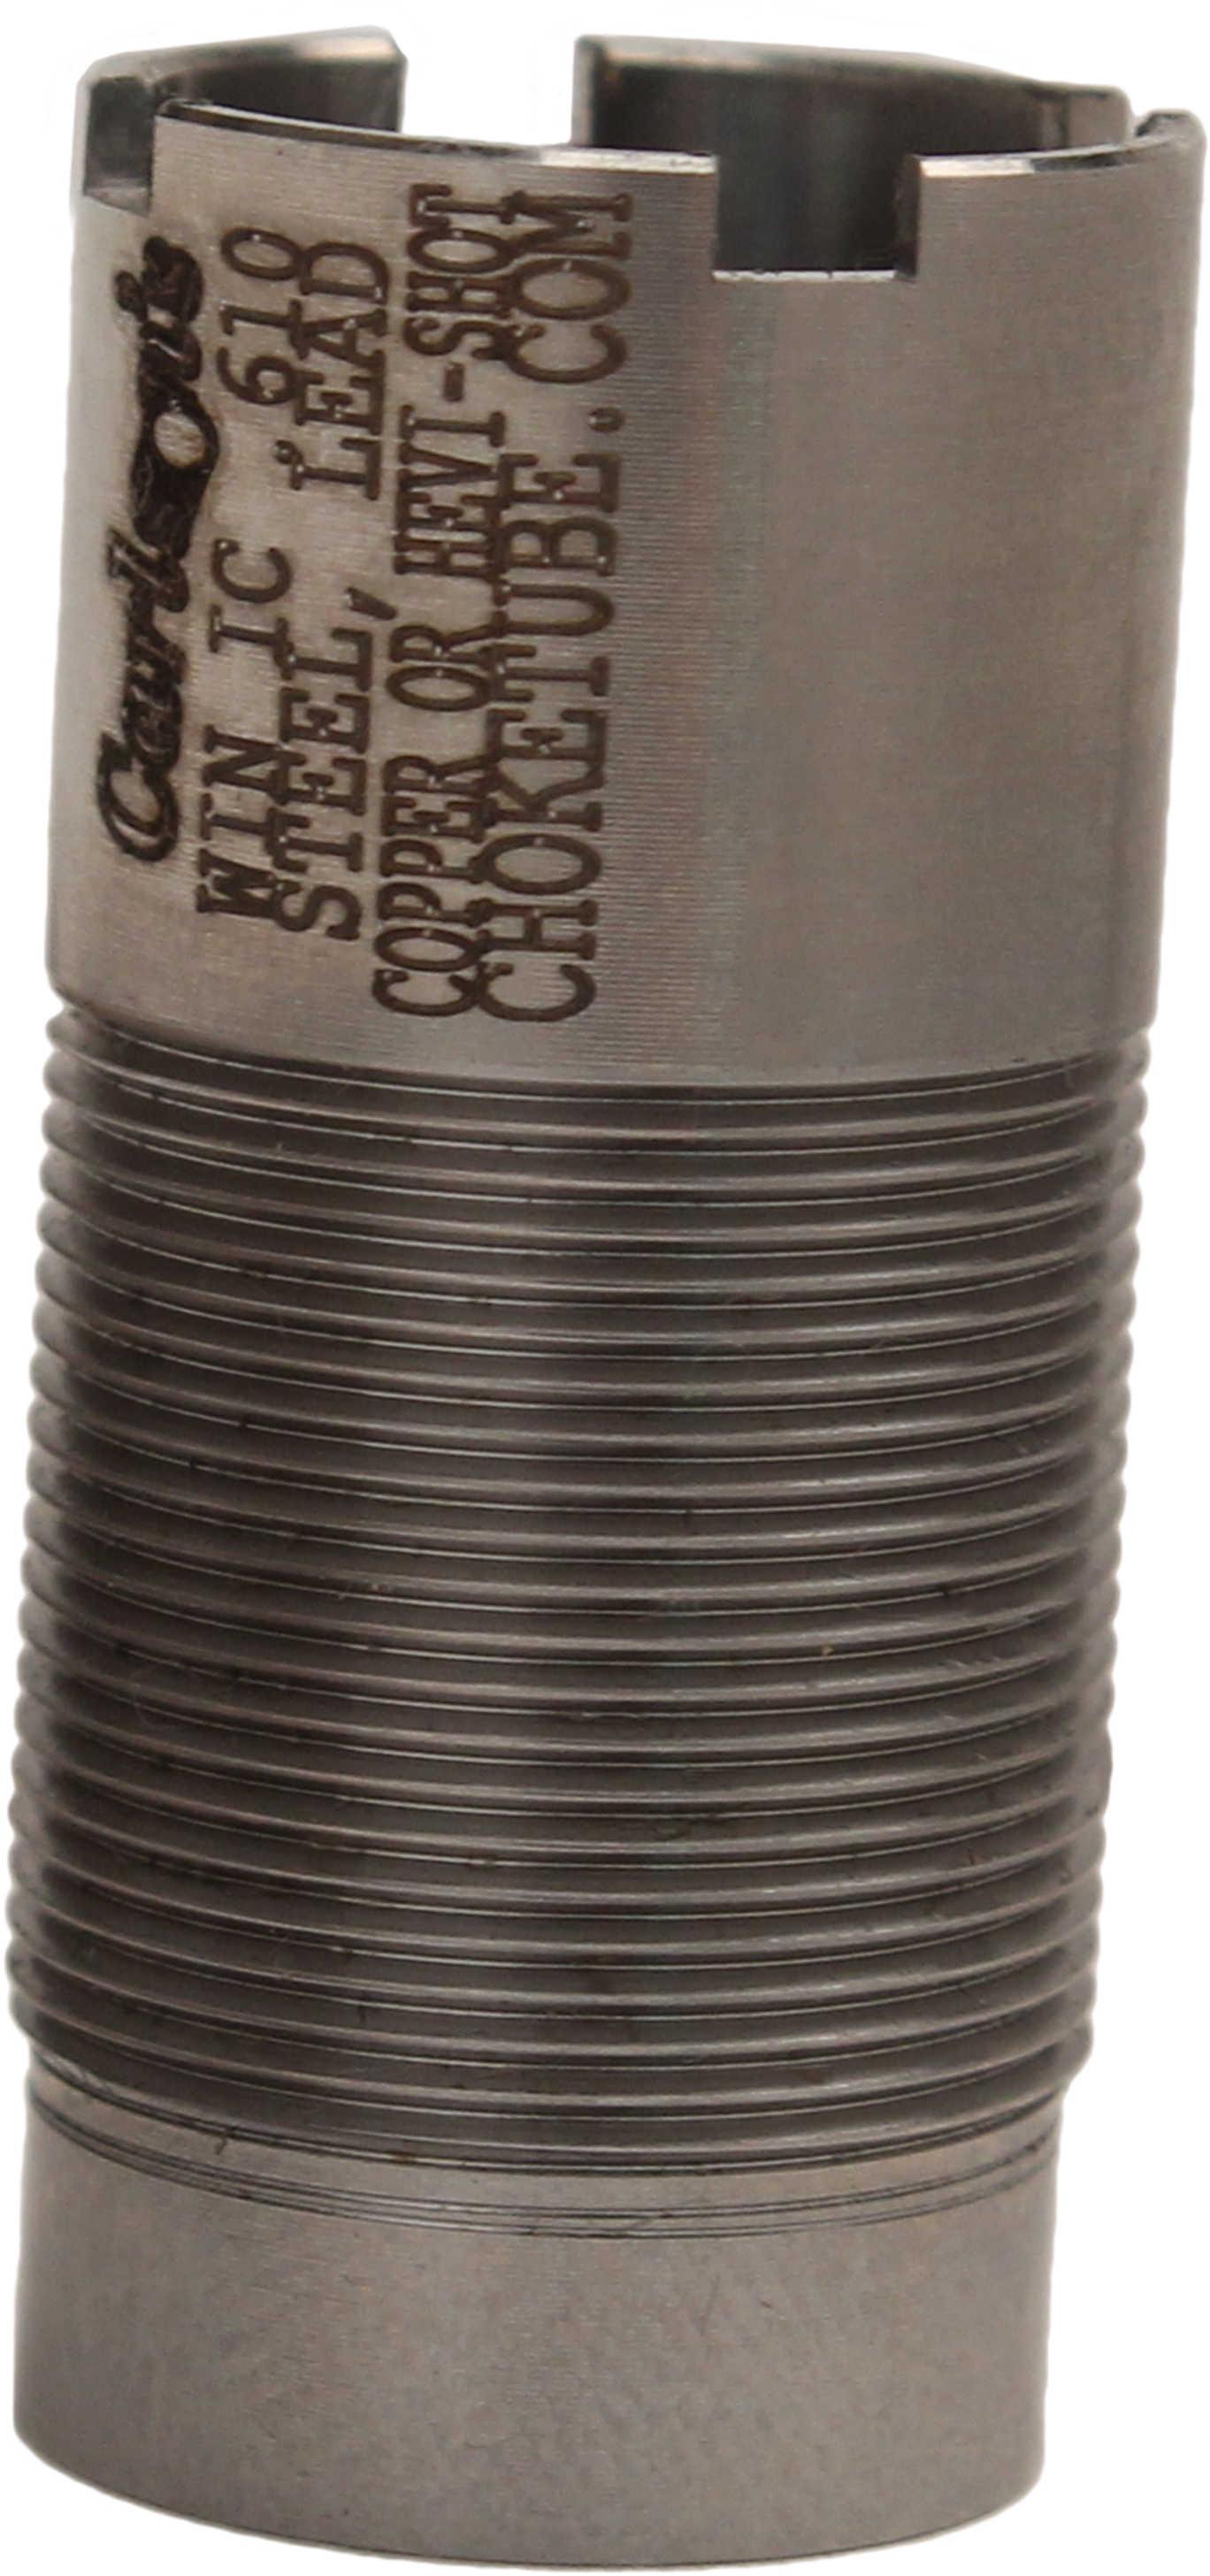 Carlson's Win/Moss/Brng/Wby Flush Mount Choke Tube 20 Gauge, Improved Cylinder .610 Md: 10102